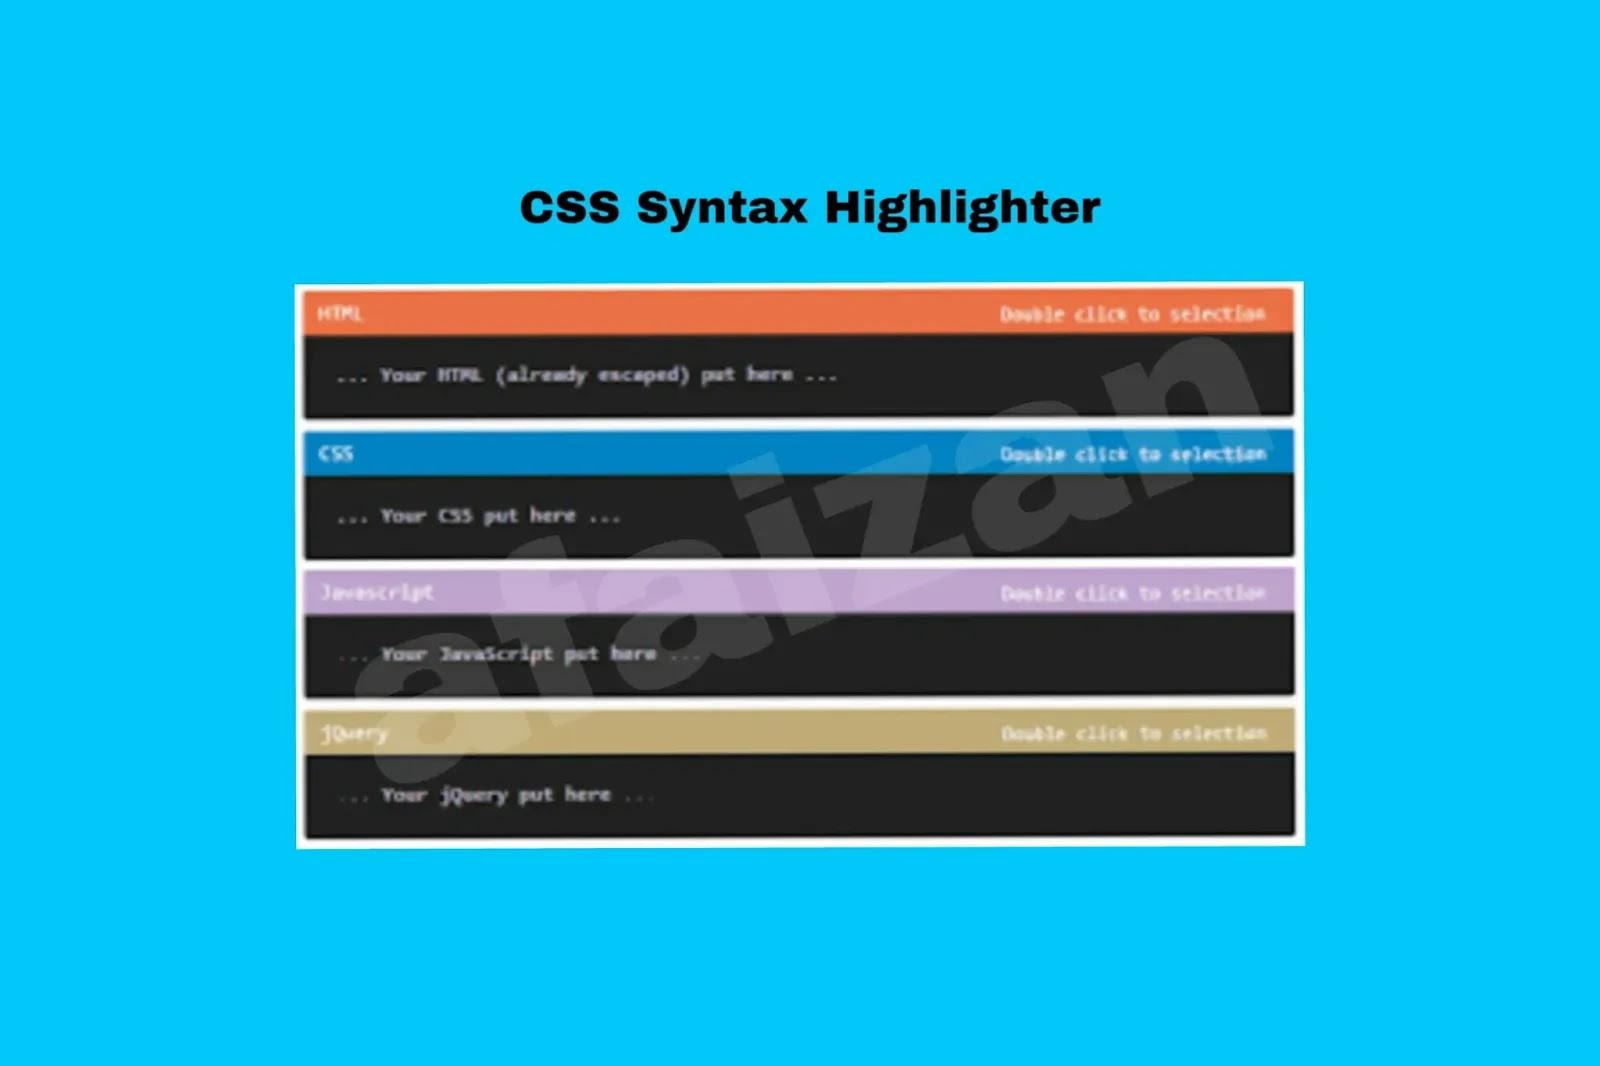 Memasang Kotak Kode CSS Syntax Highlighter Dalam Postingan